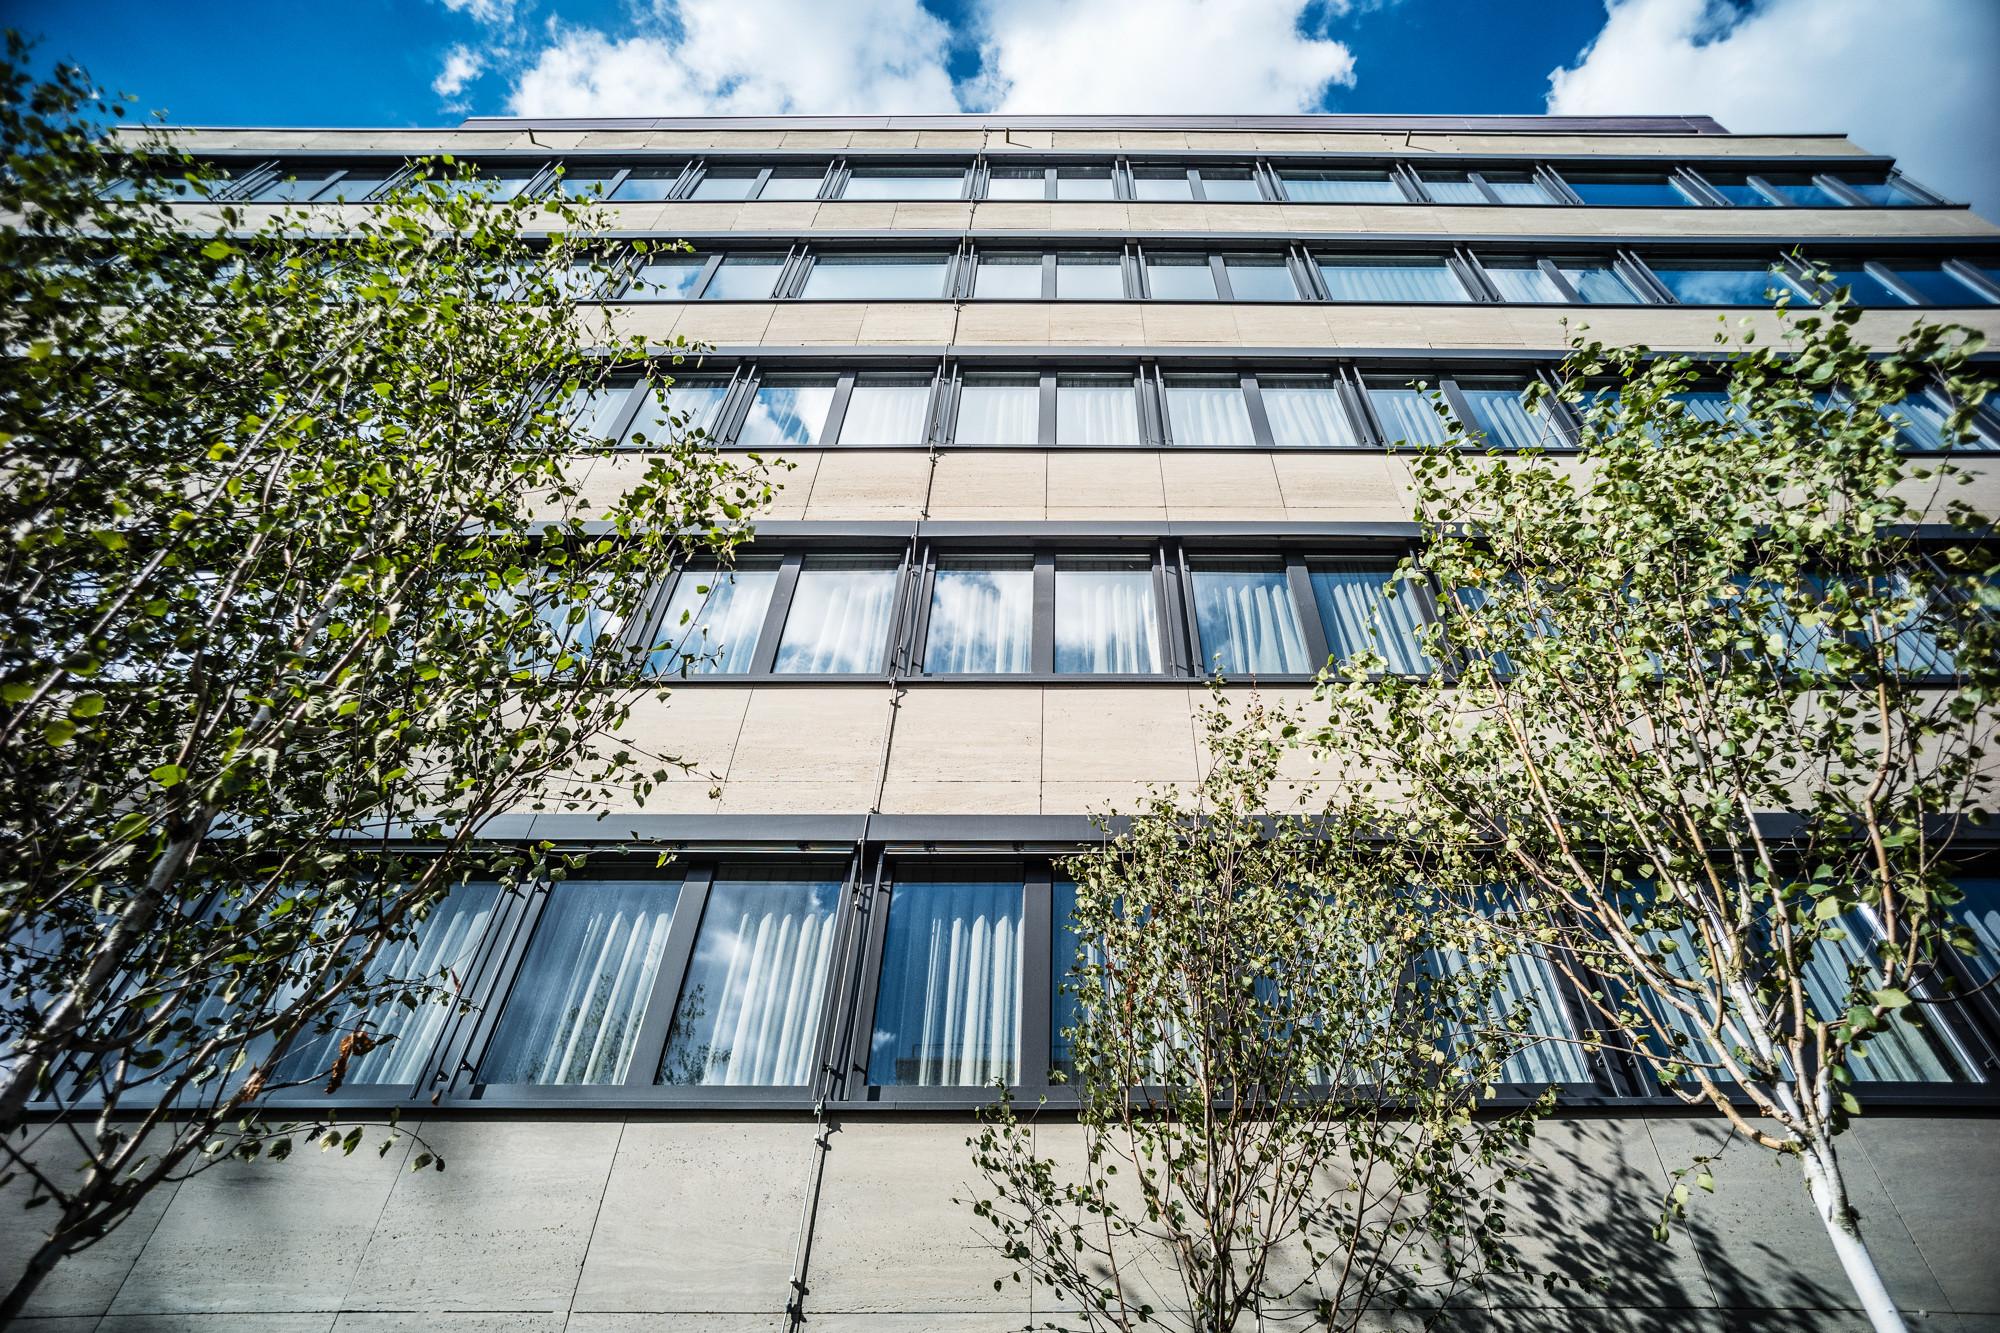 Tolle hotel goldene uhr weingarten schmuck website for Design hotel franken